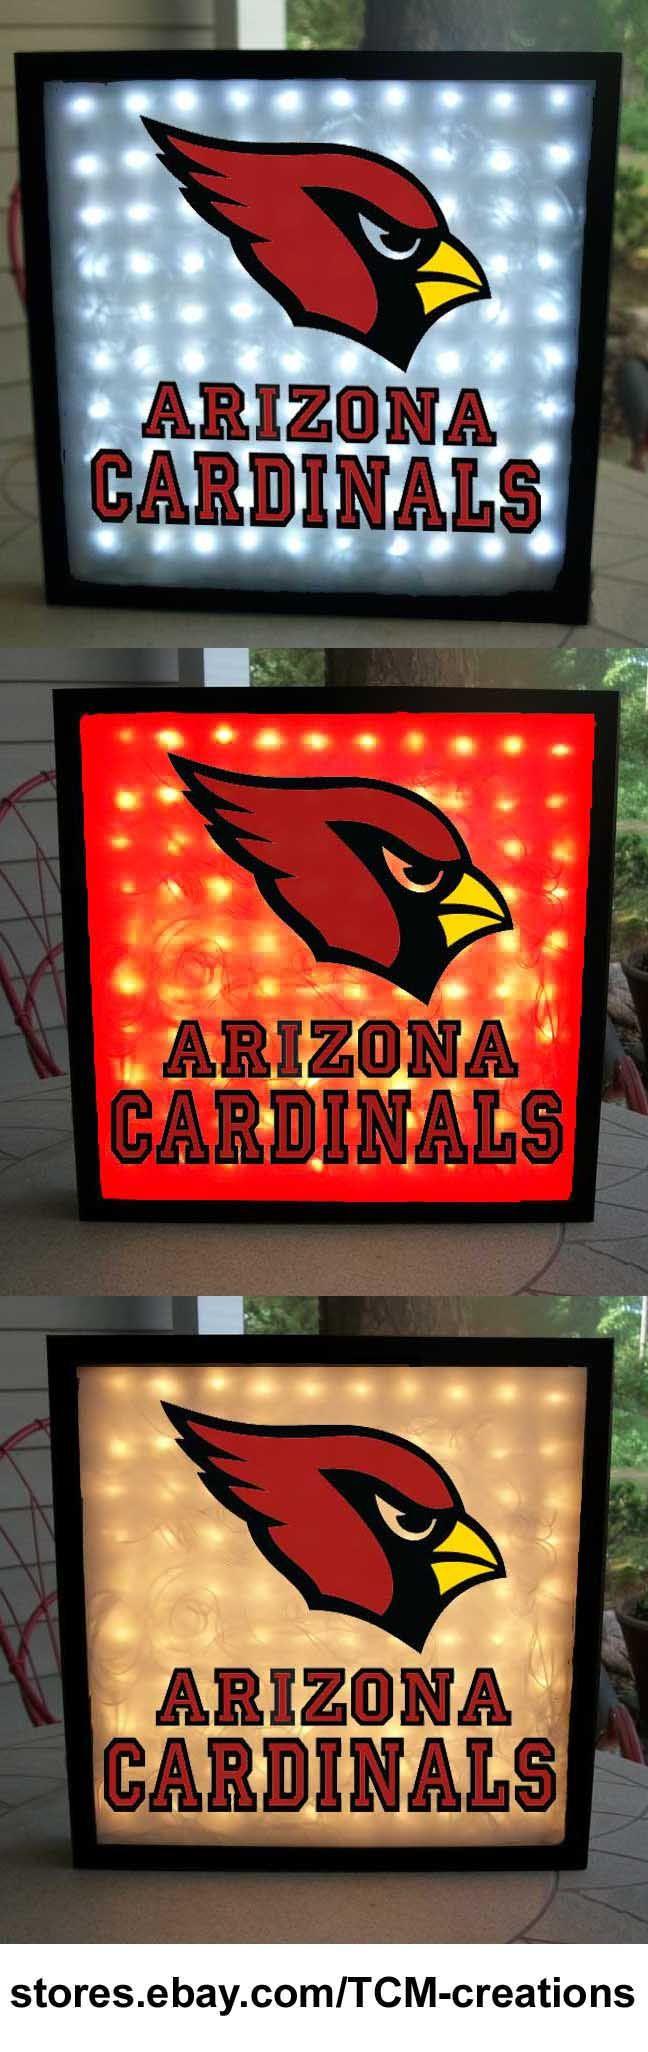 Arizona Cardinals shadow boxes with LED lighting.  NFL.